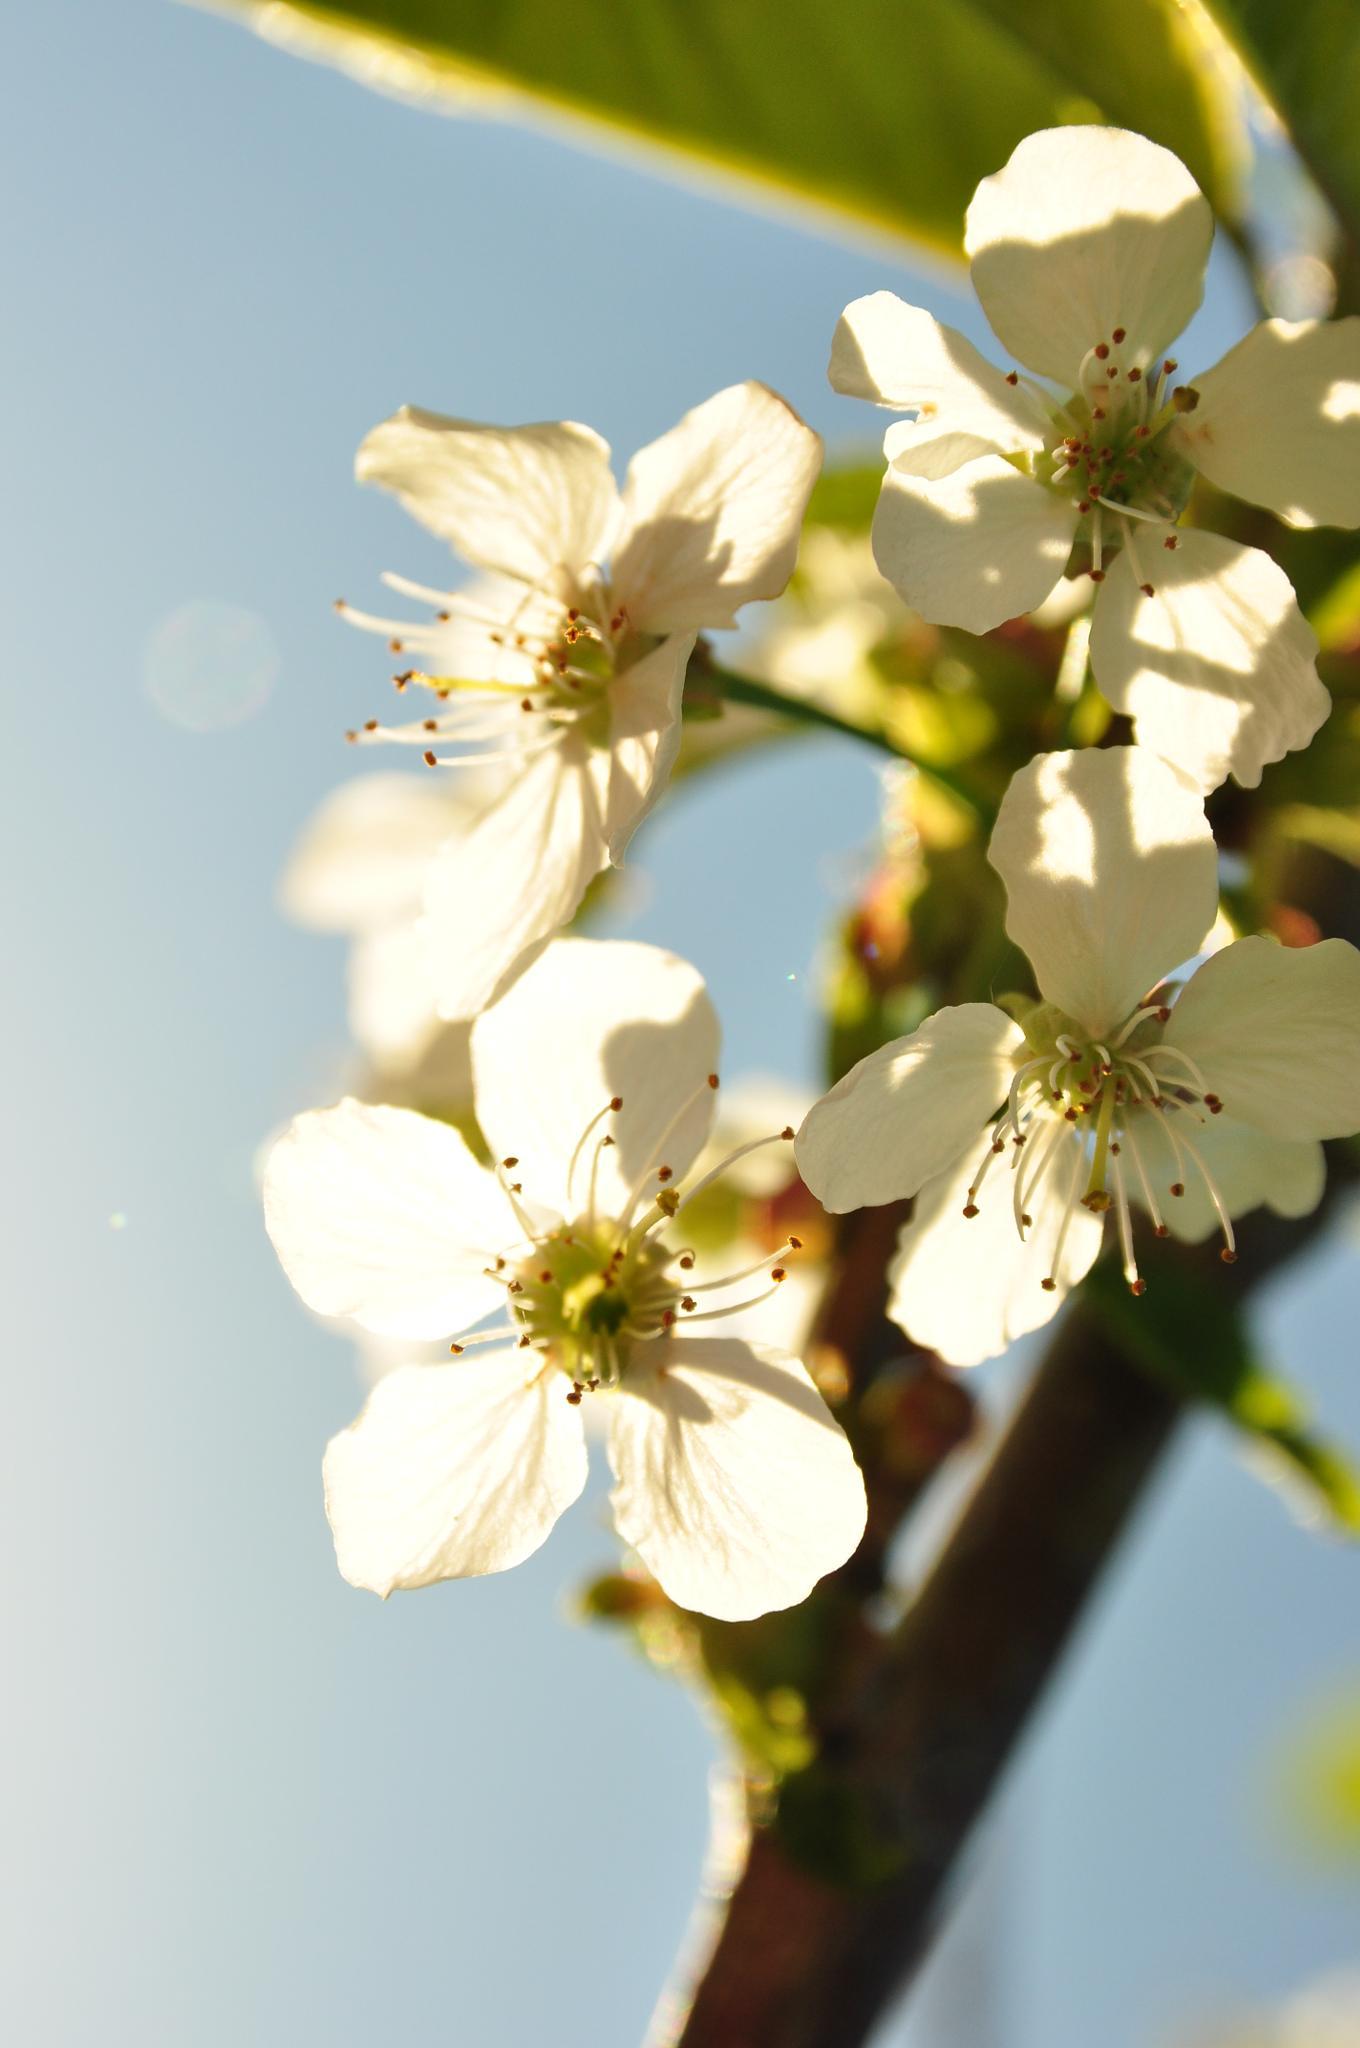 Cherry Blossom by Victoria Gustavsson